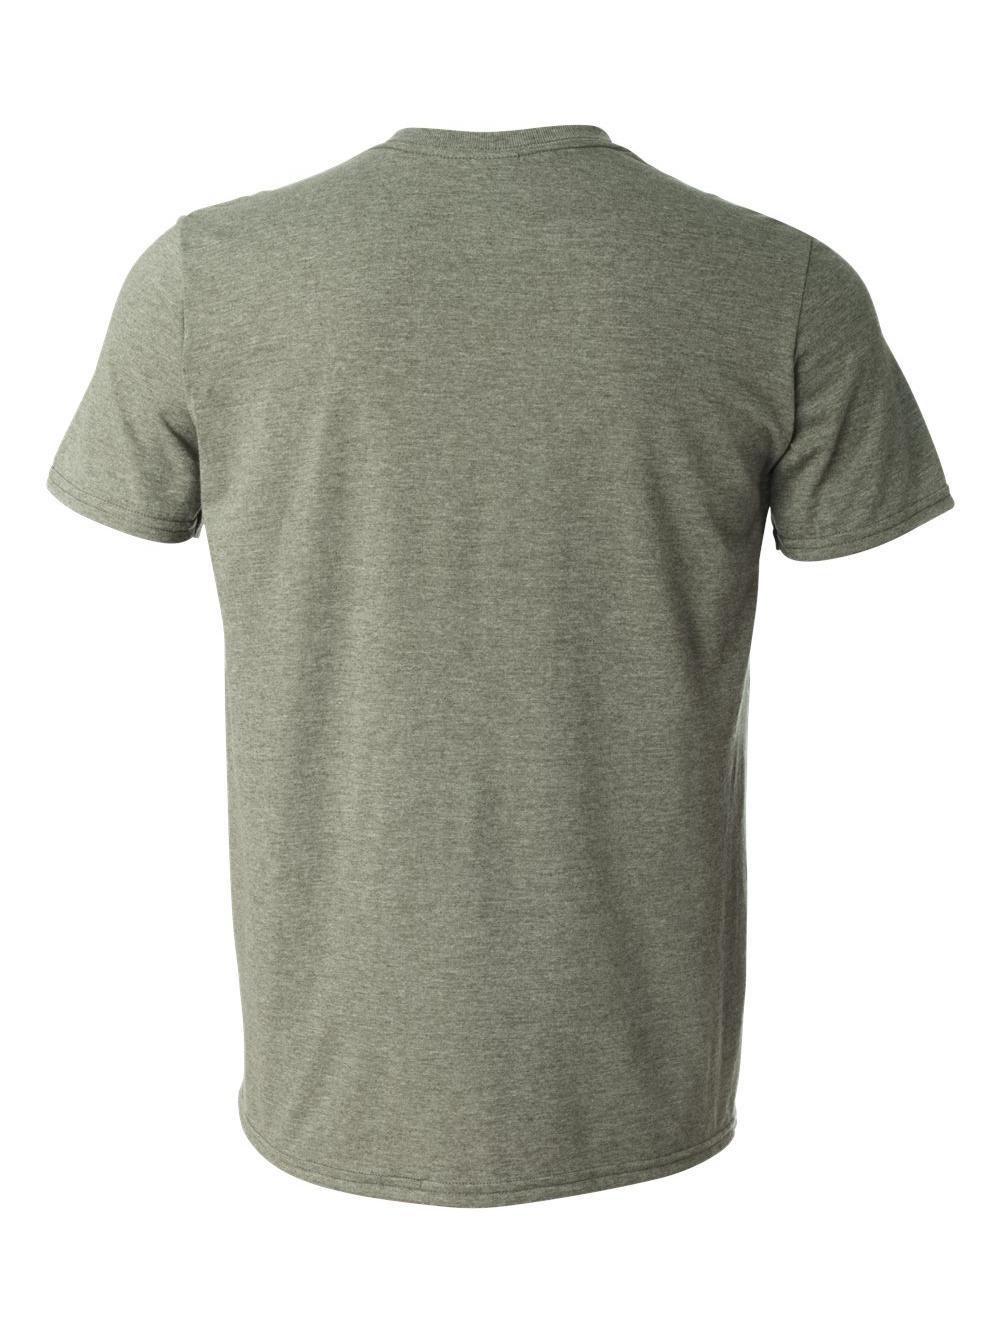 Gildan-Softstyle-T-Shirt-64000 thumbnail 82